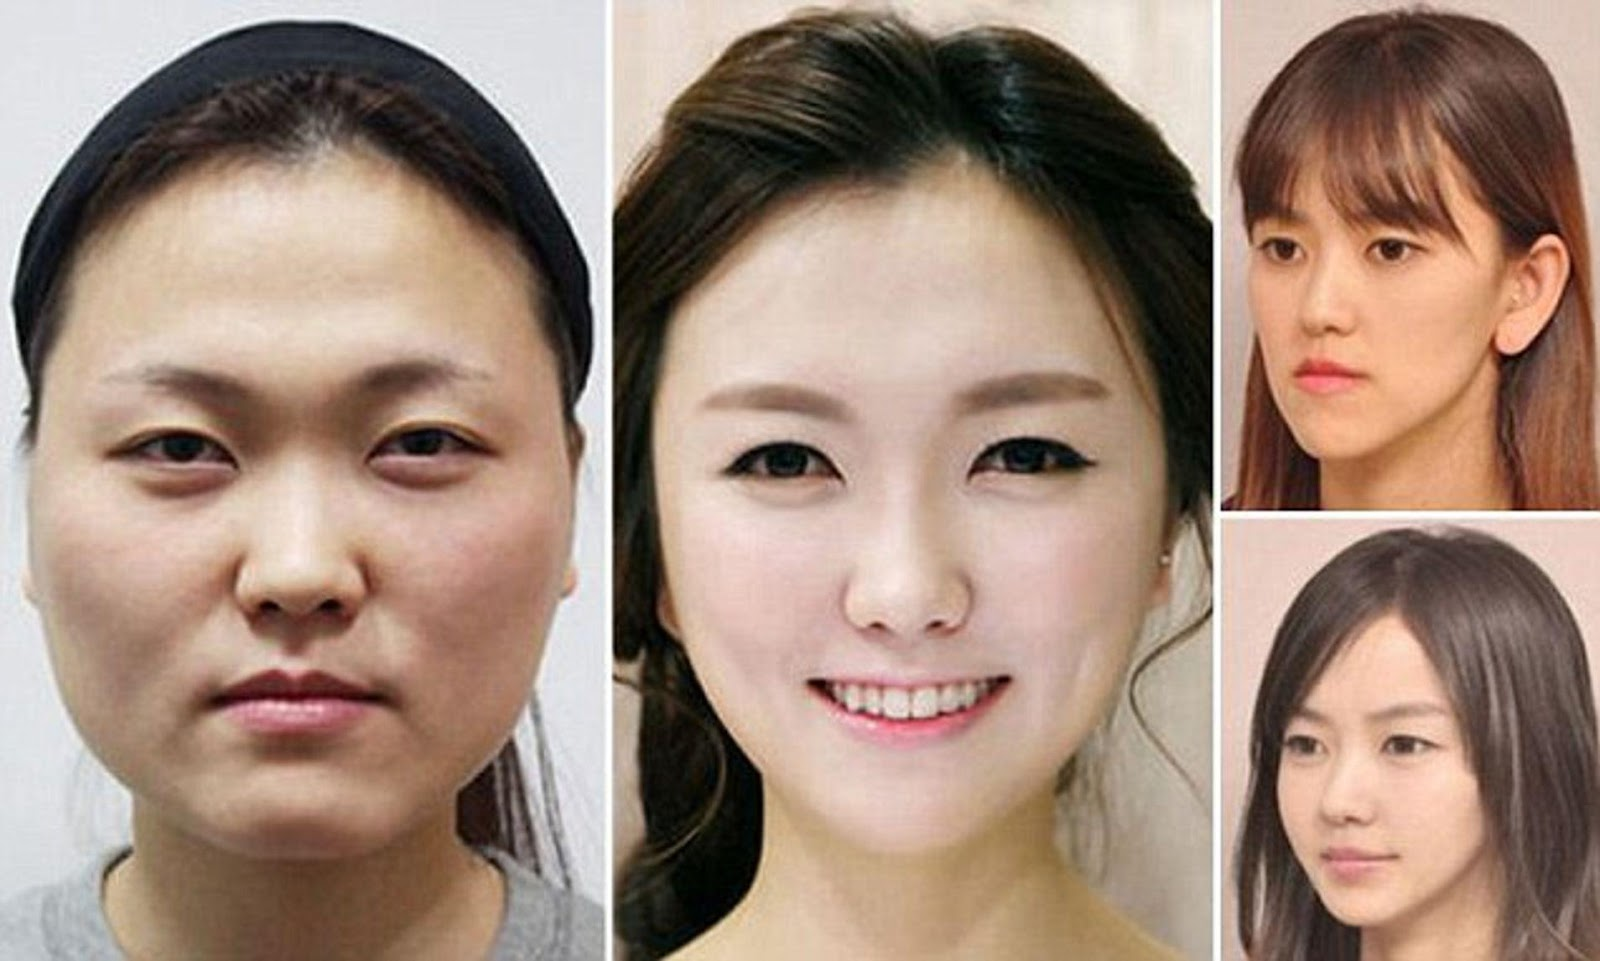 article-2610231-1D43C35A00000578-693_636x382.jpg V-line jaw surgery